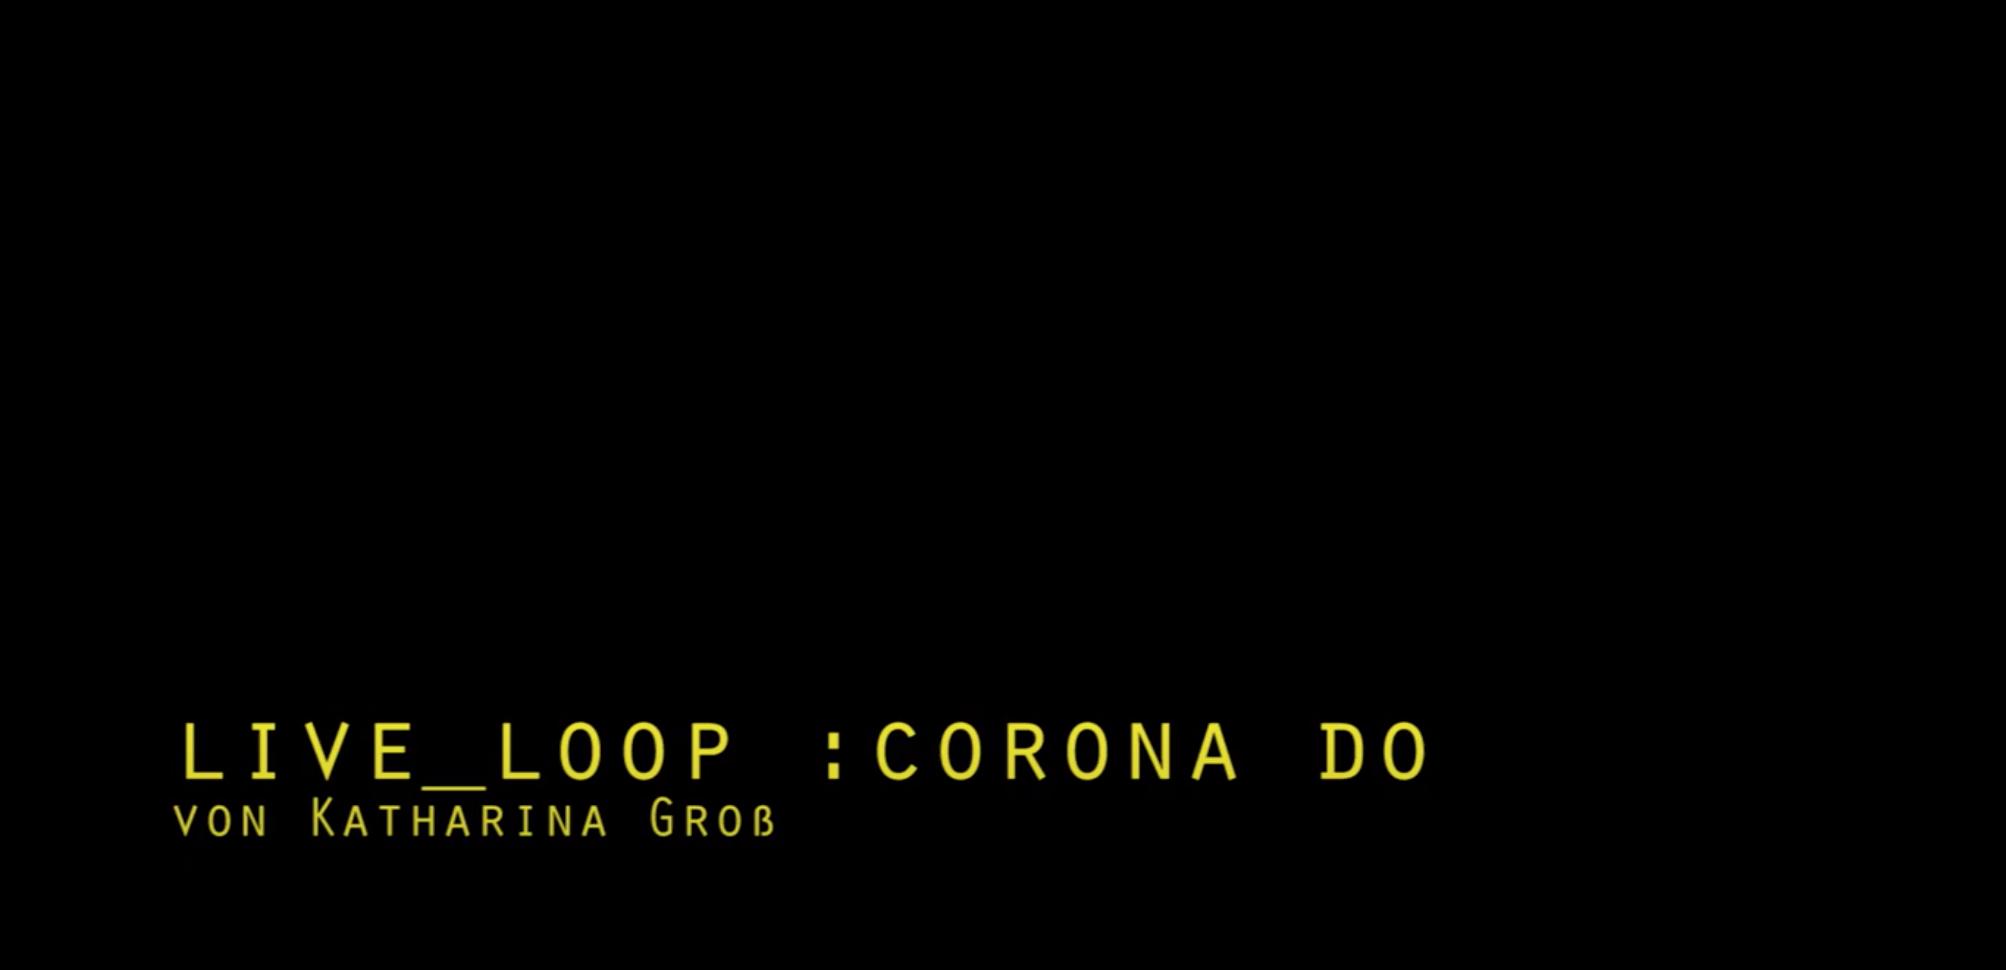 live_loop corona